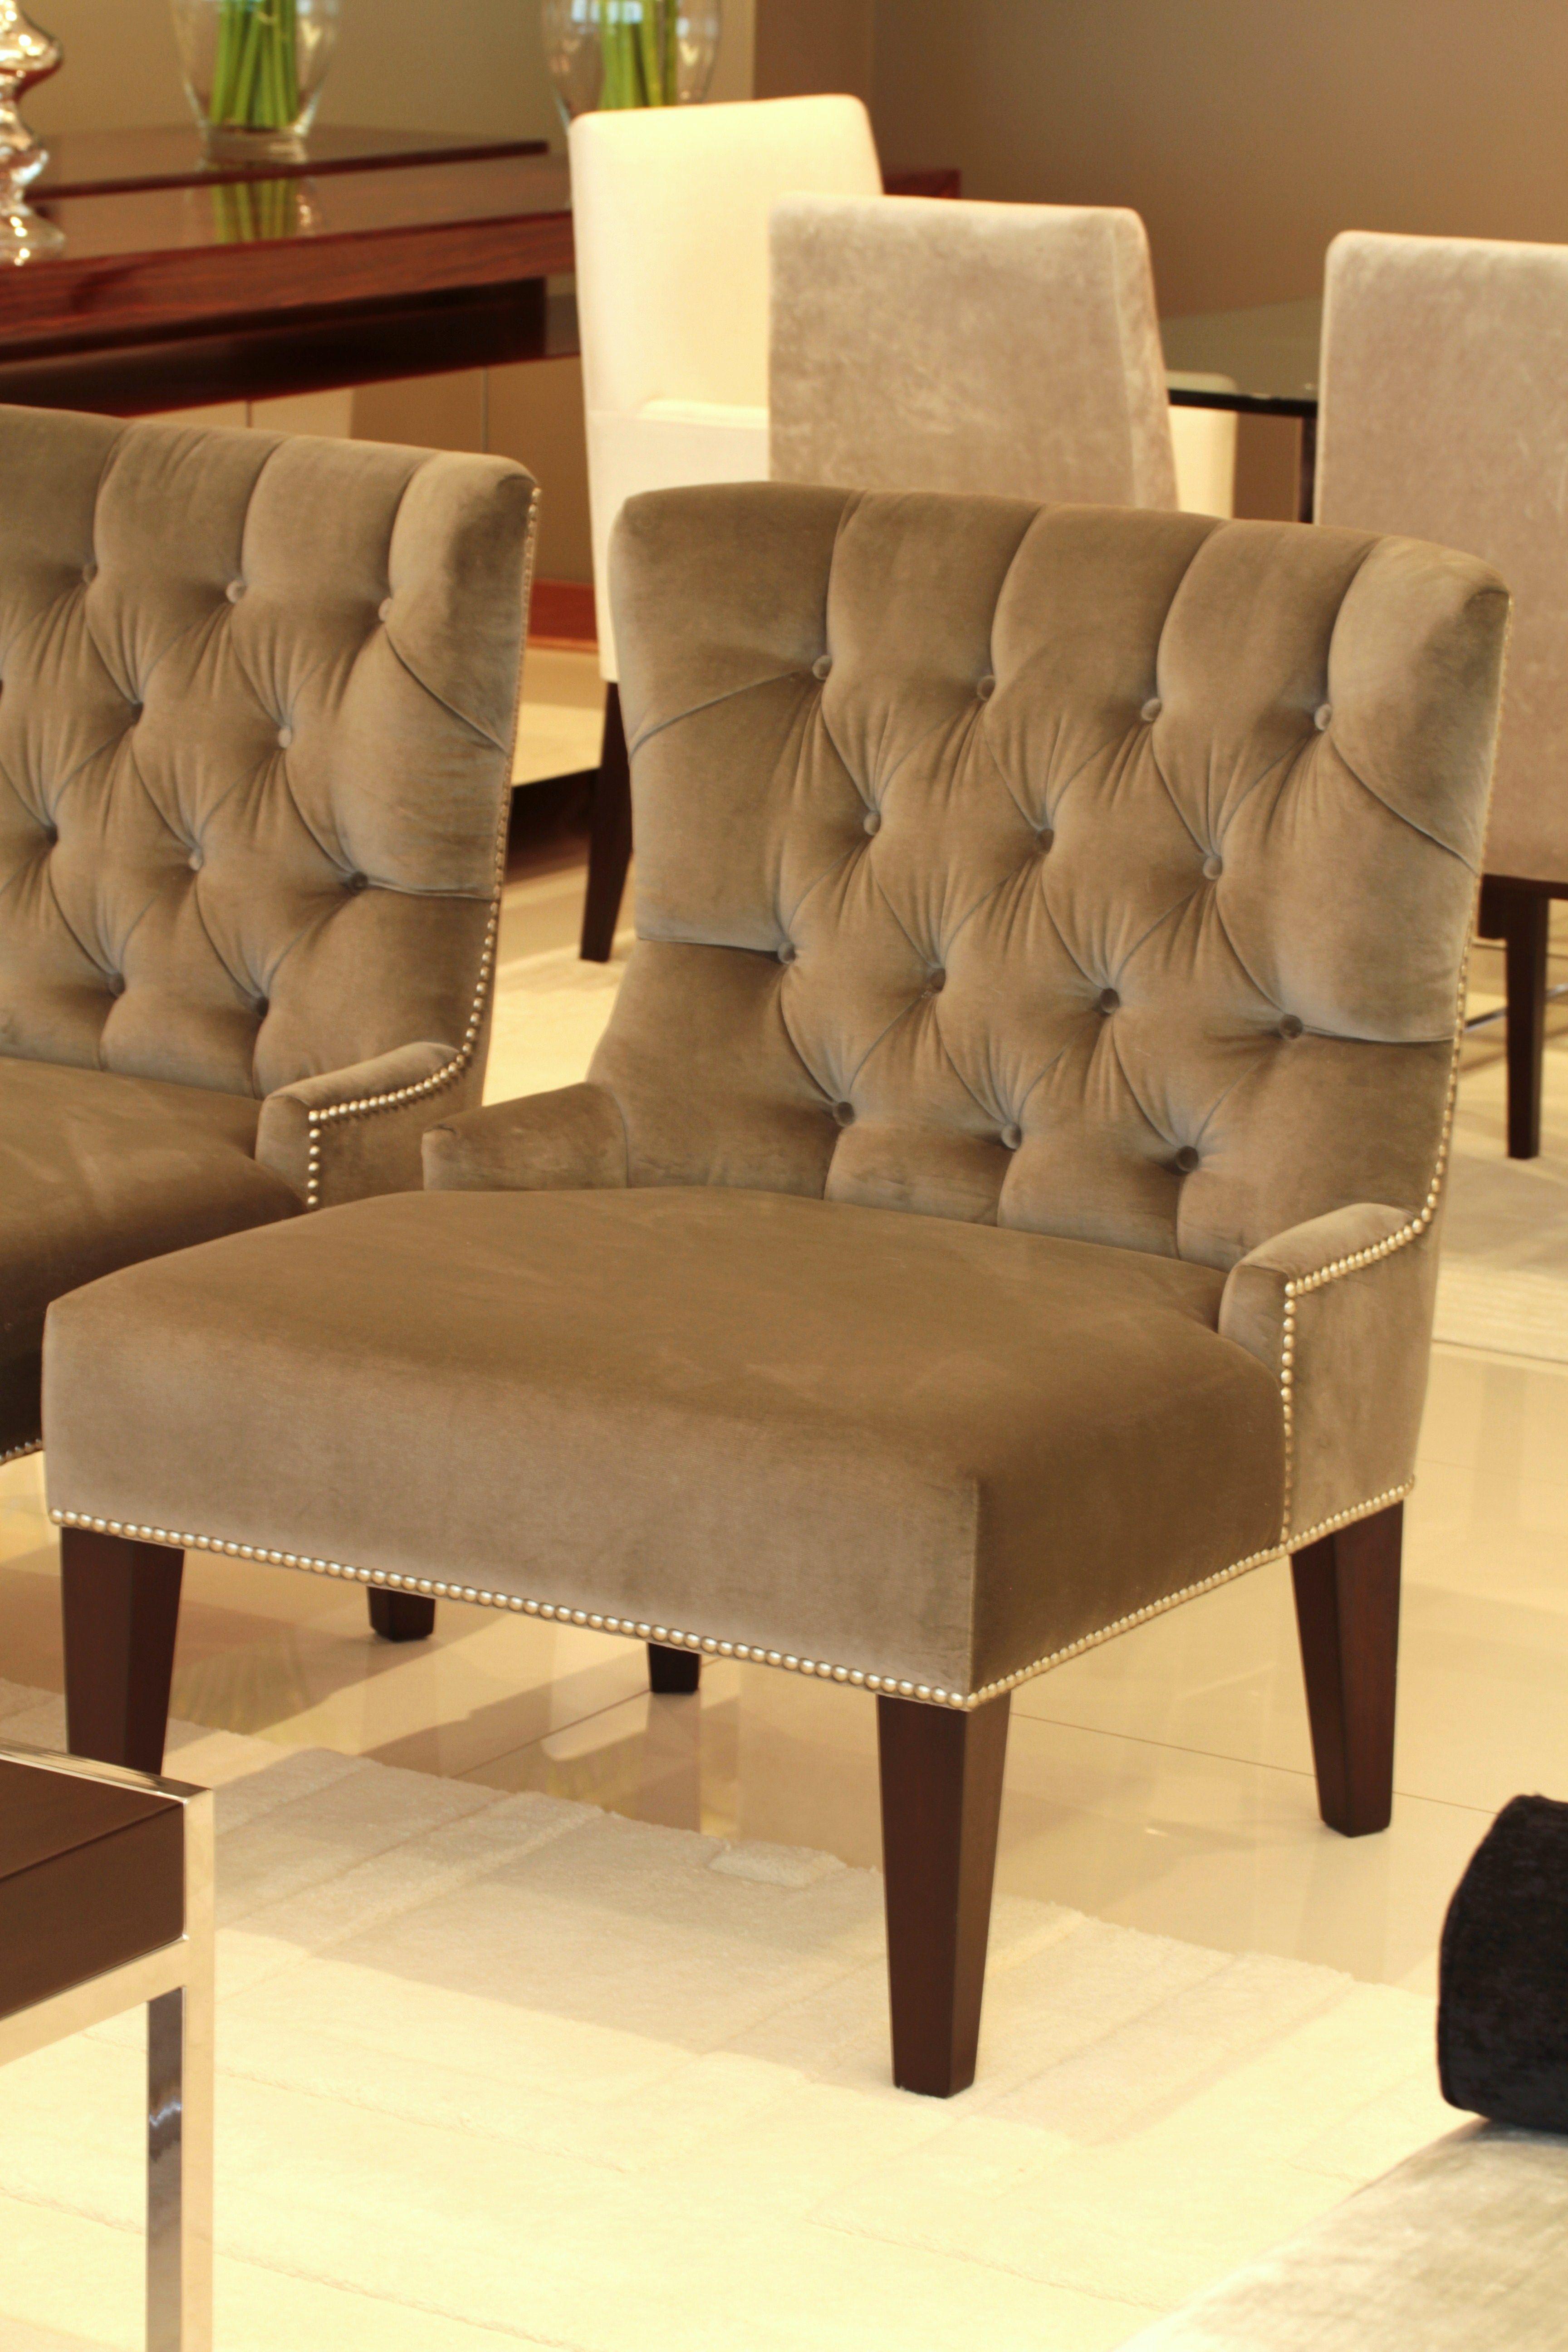 Butaca provenza de la colecci n europa livingdesign for Europa muebles